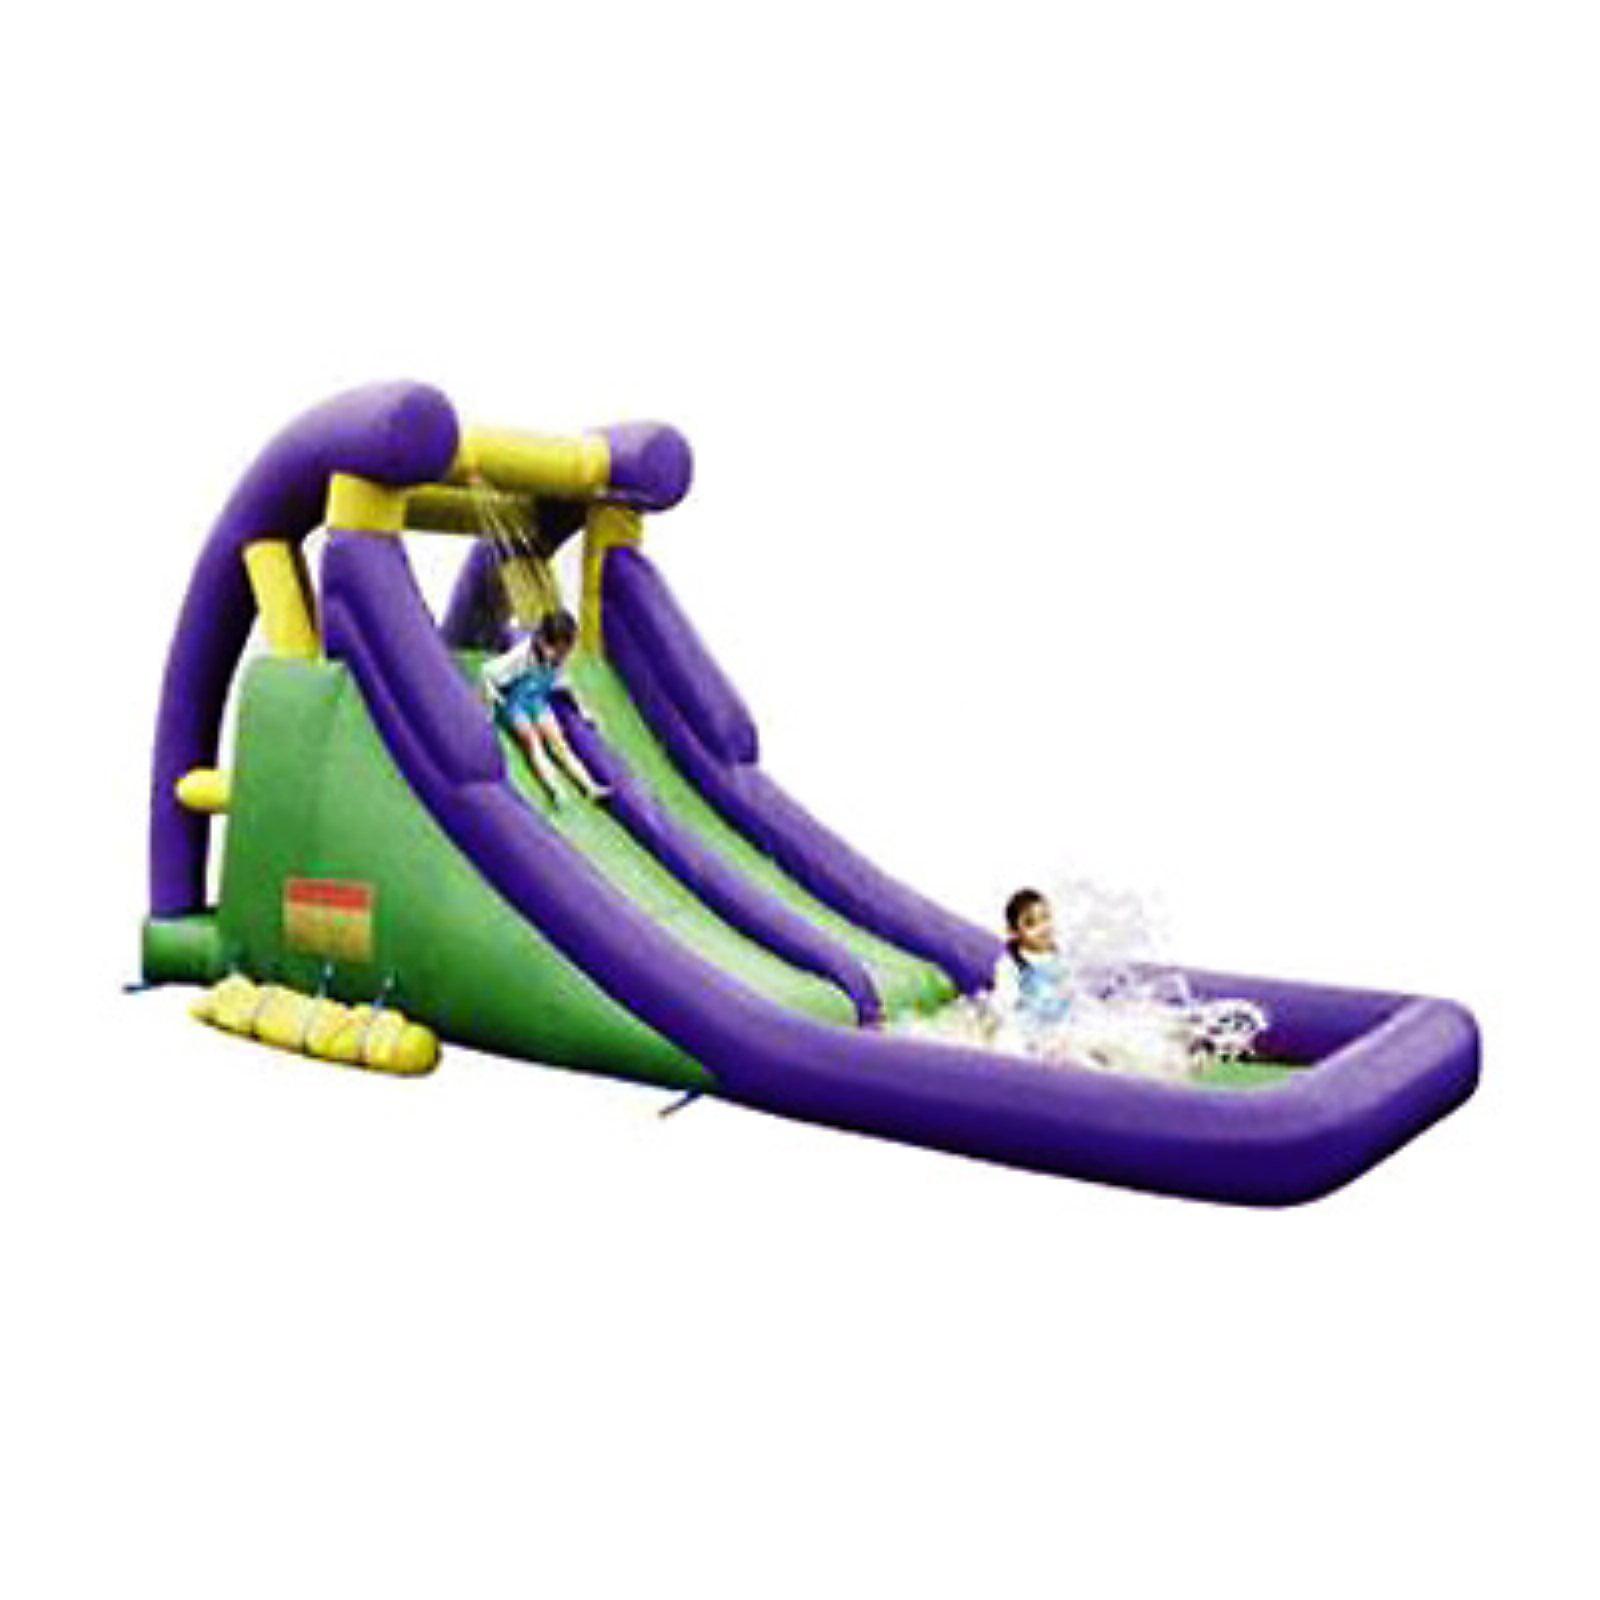 KidWise Double Inflatable Waterslide by Kidwise